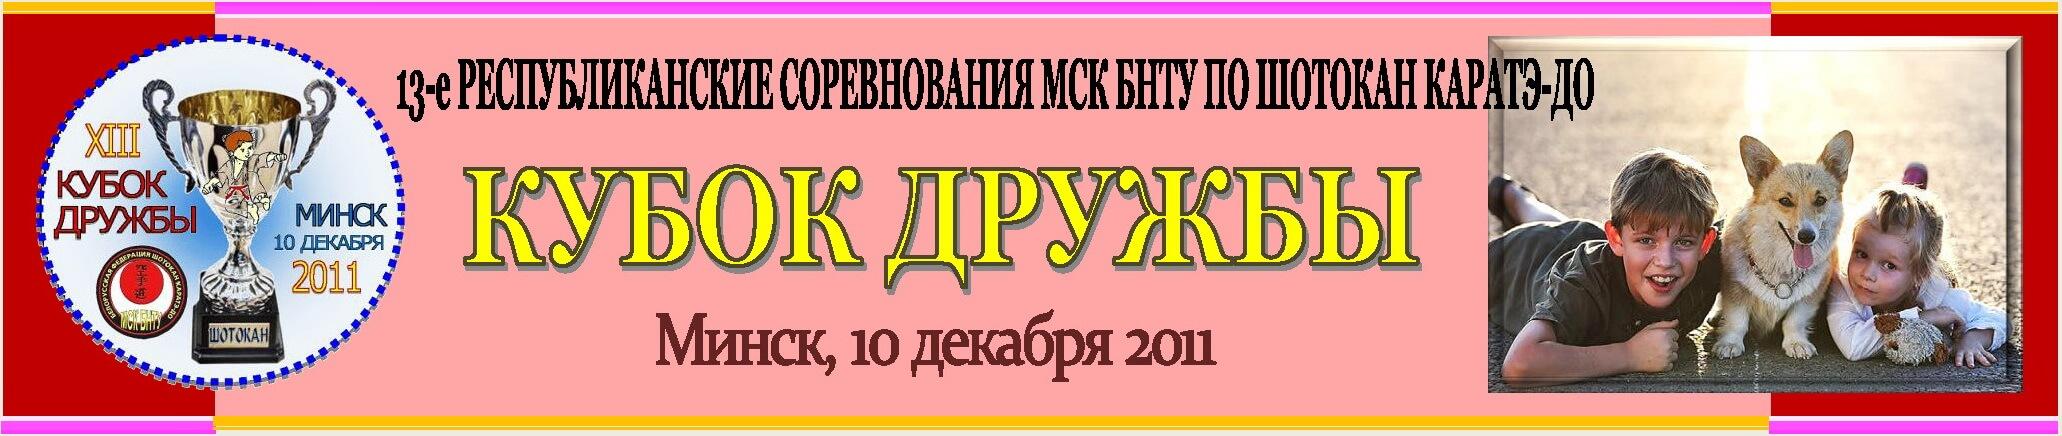 Кубок Дружбы-2011 Баннер